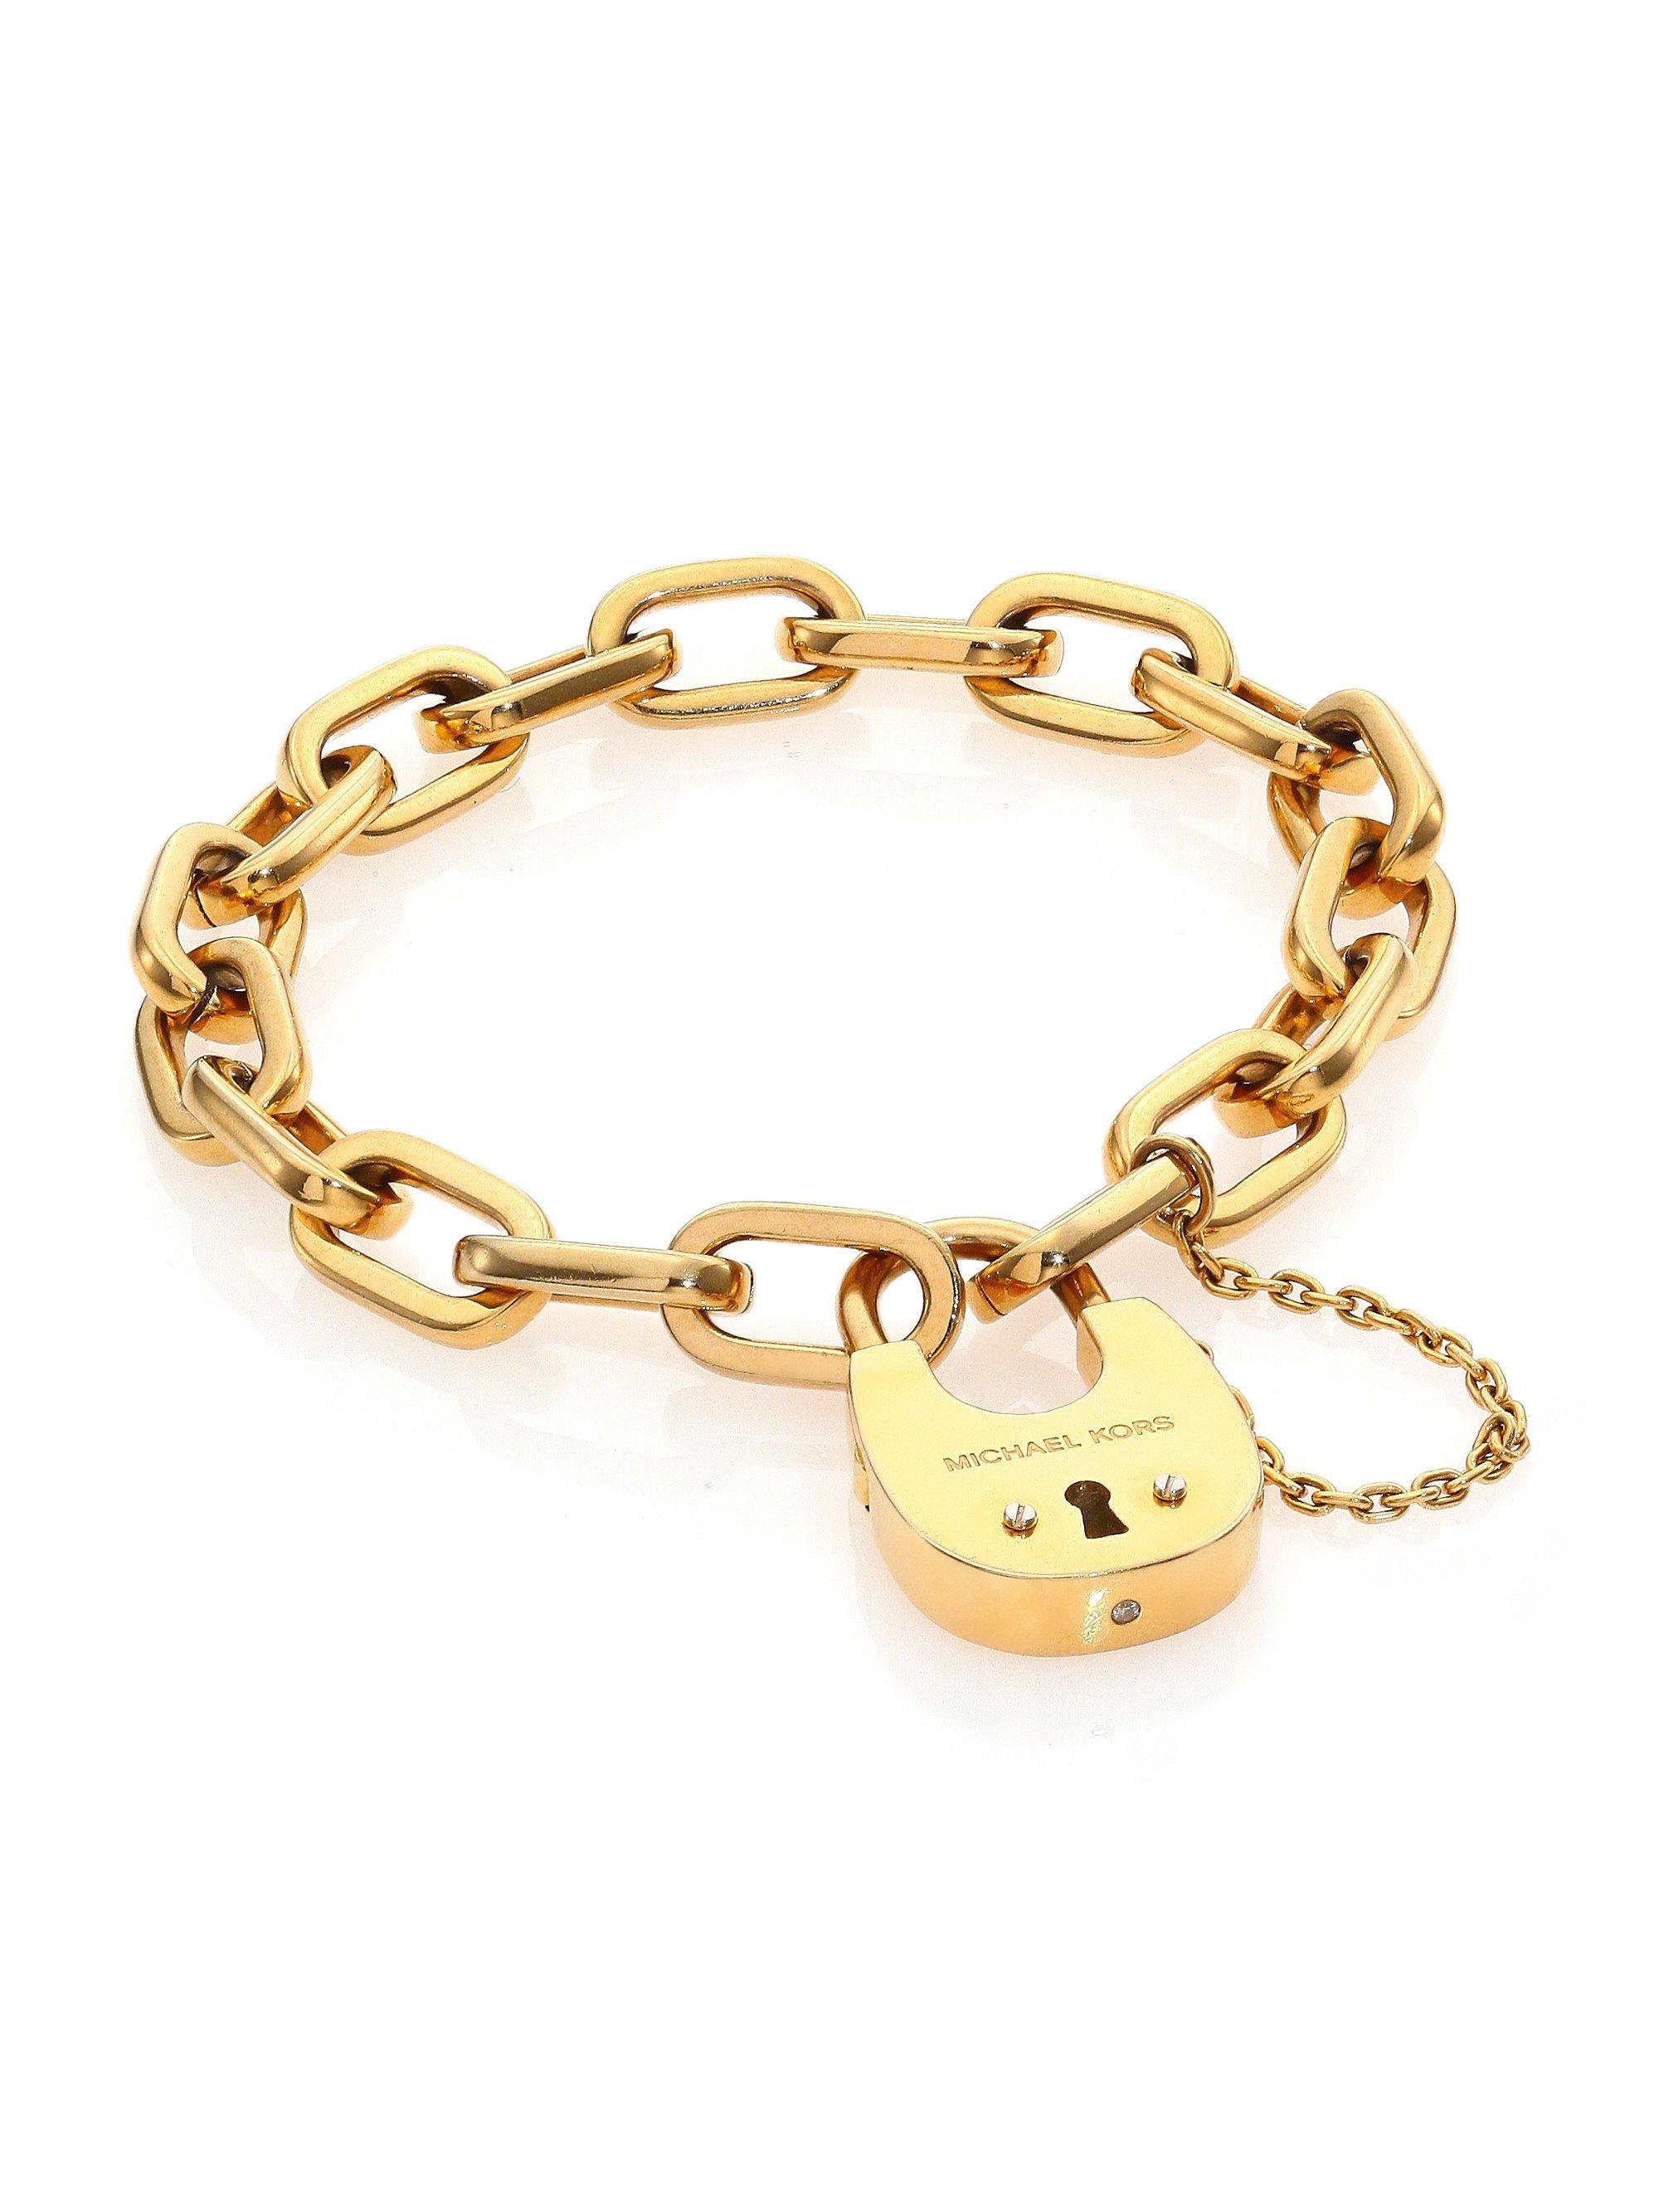 michael kors cityscape hardware padlock chain bracelet. Black Bedroom Furniture Sets. Home Design Ideas